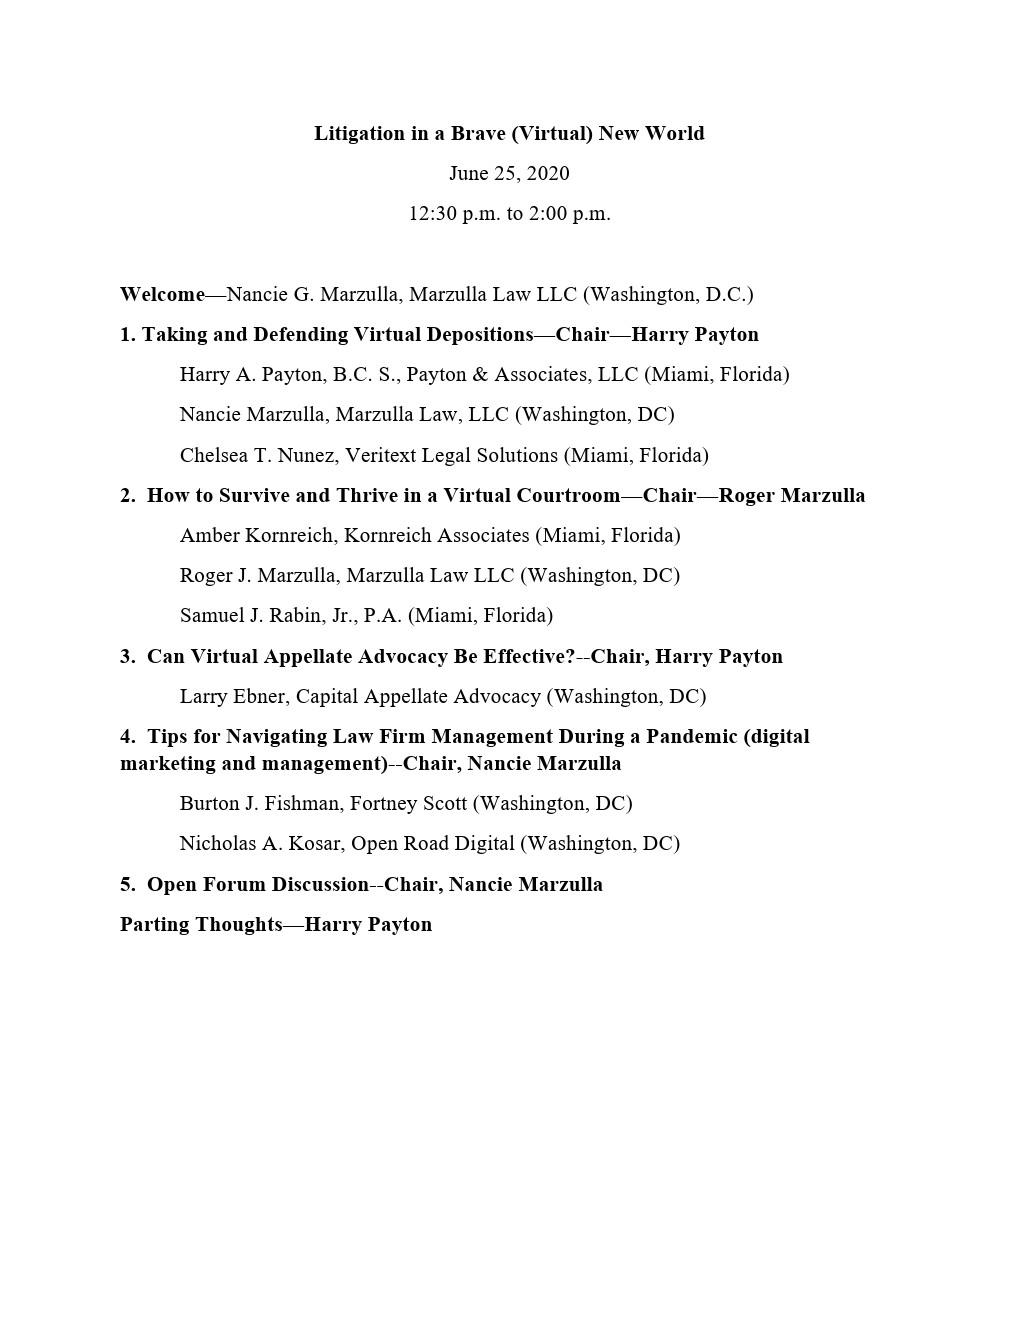 Webinar-agenda